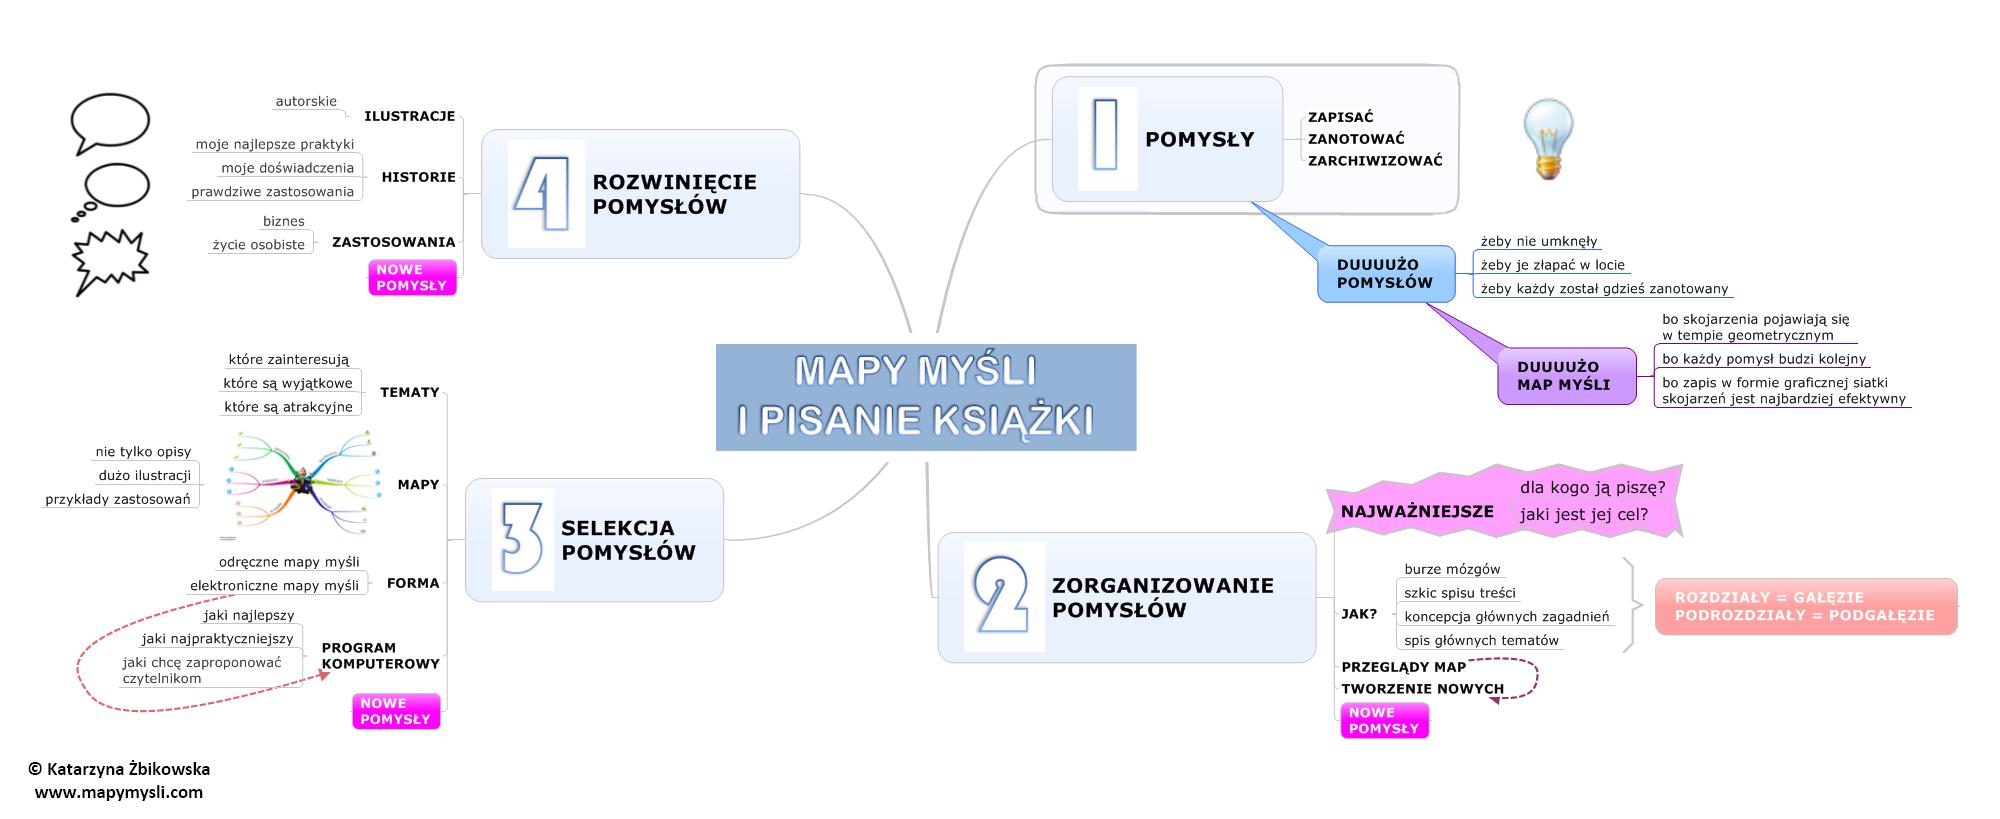 mapy-mysli-i-pisanie-ksi%C4%85%C5%BCki-mapa-my%C5%9Bli.png